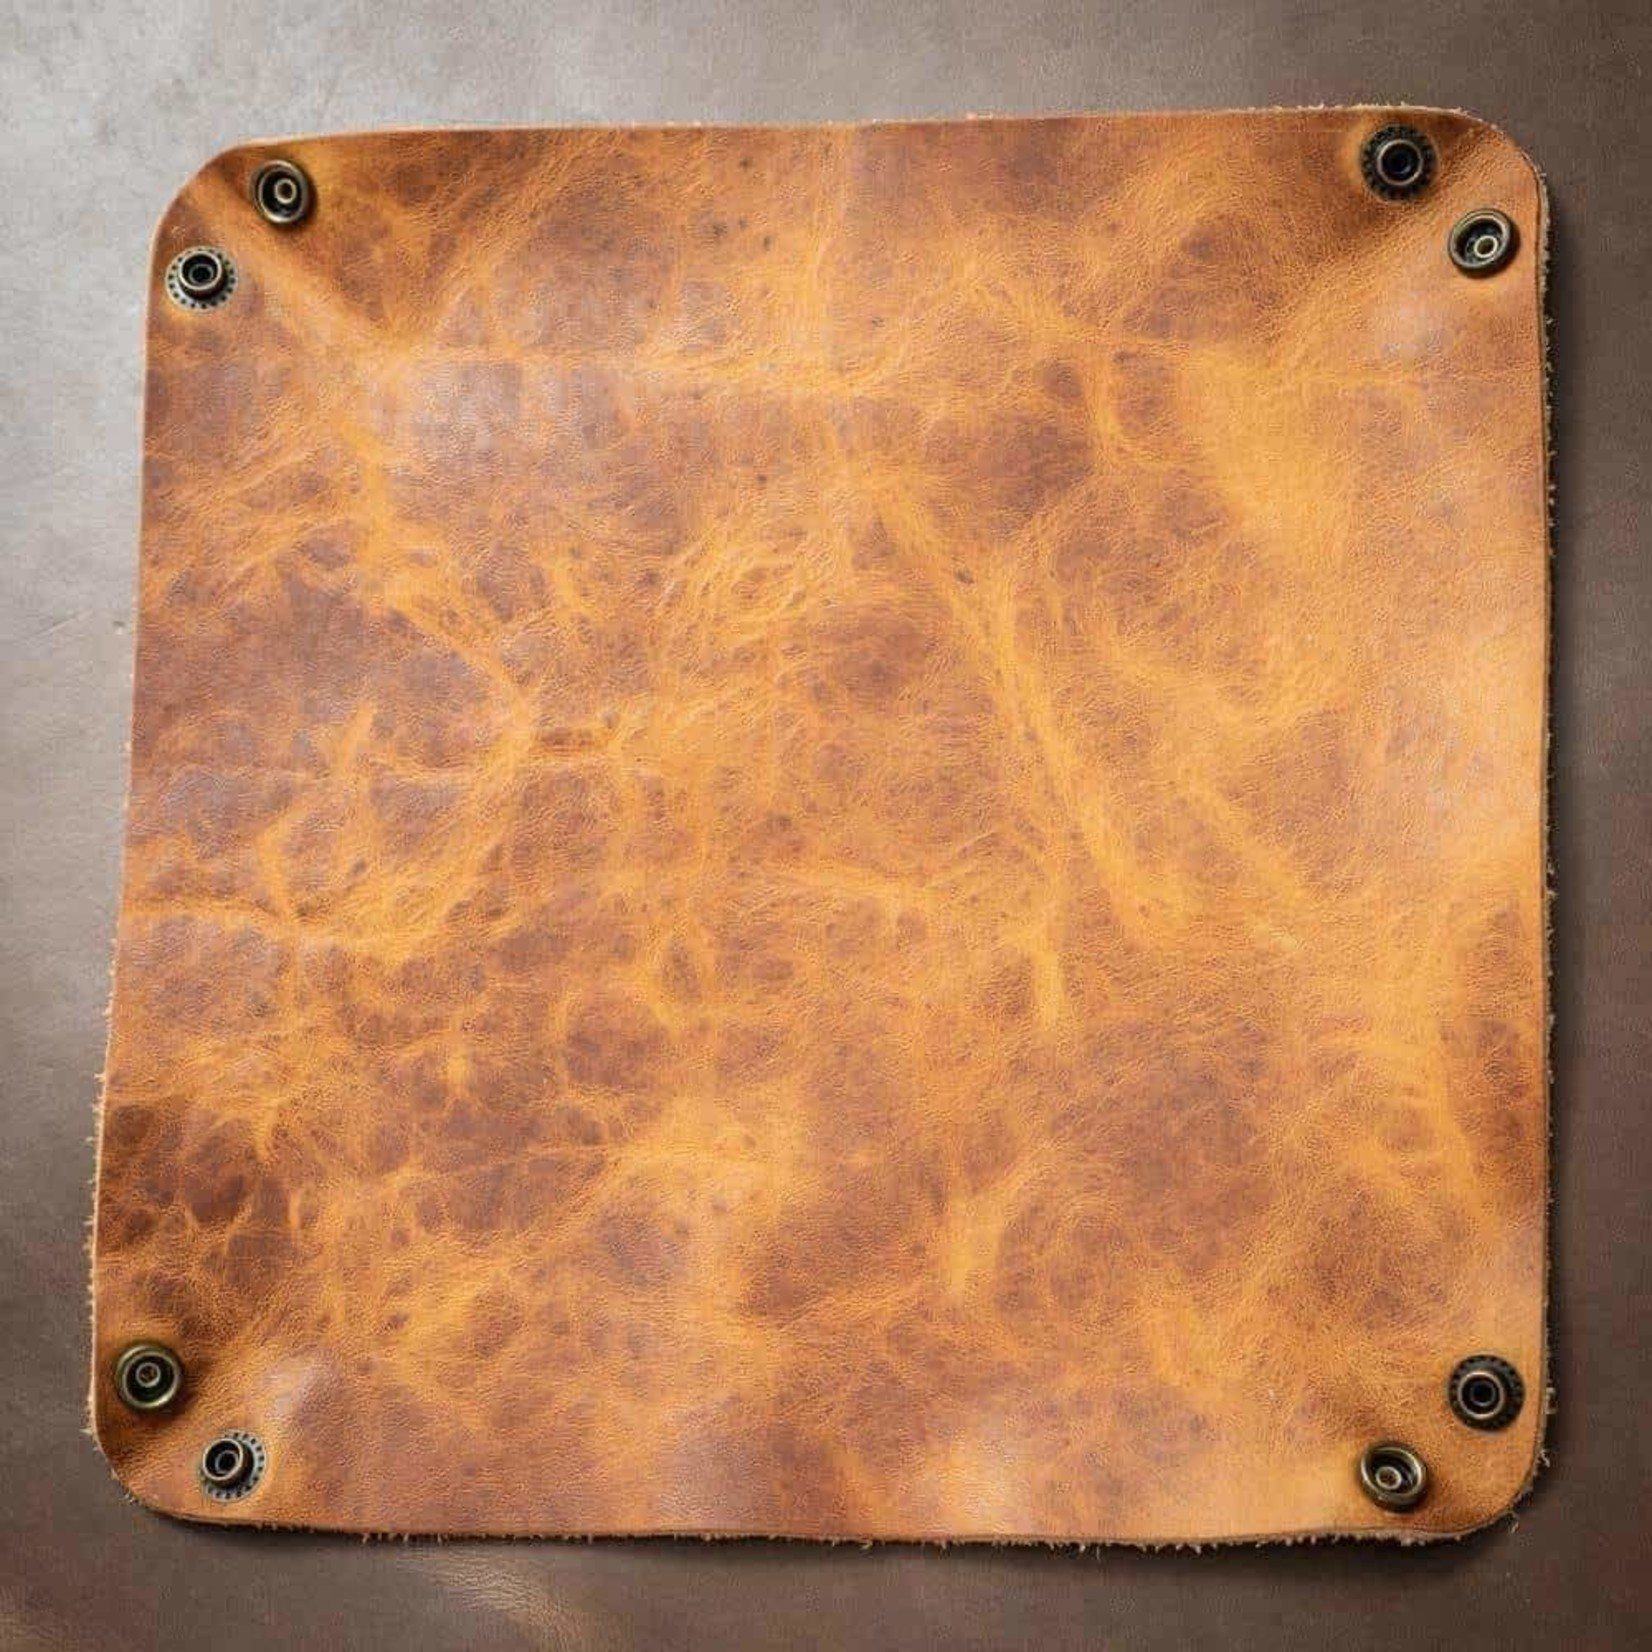 Popov Leather Popov Leather Valet Tray English Tan